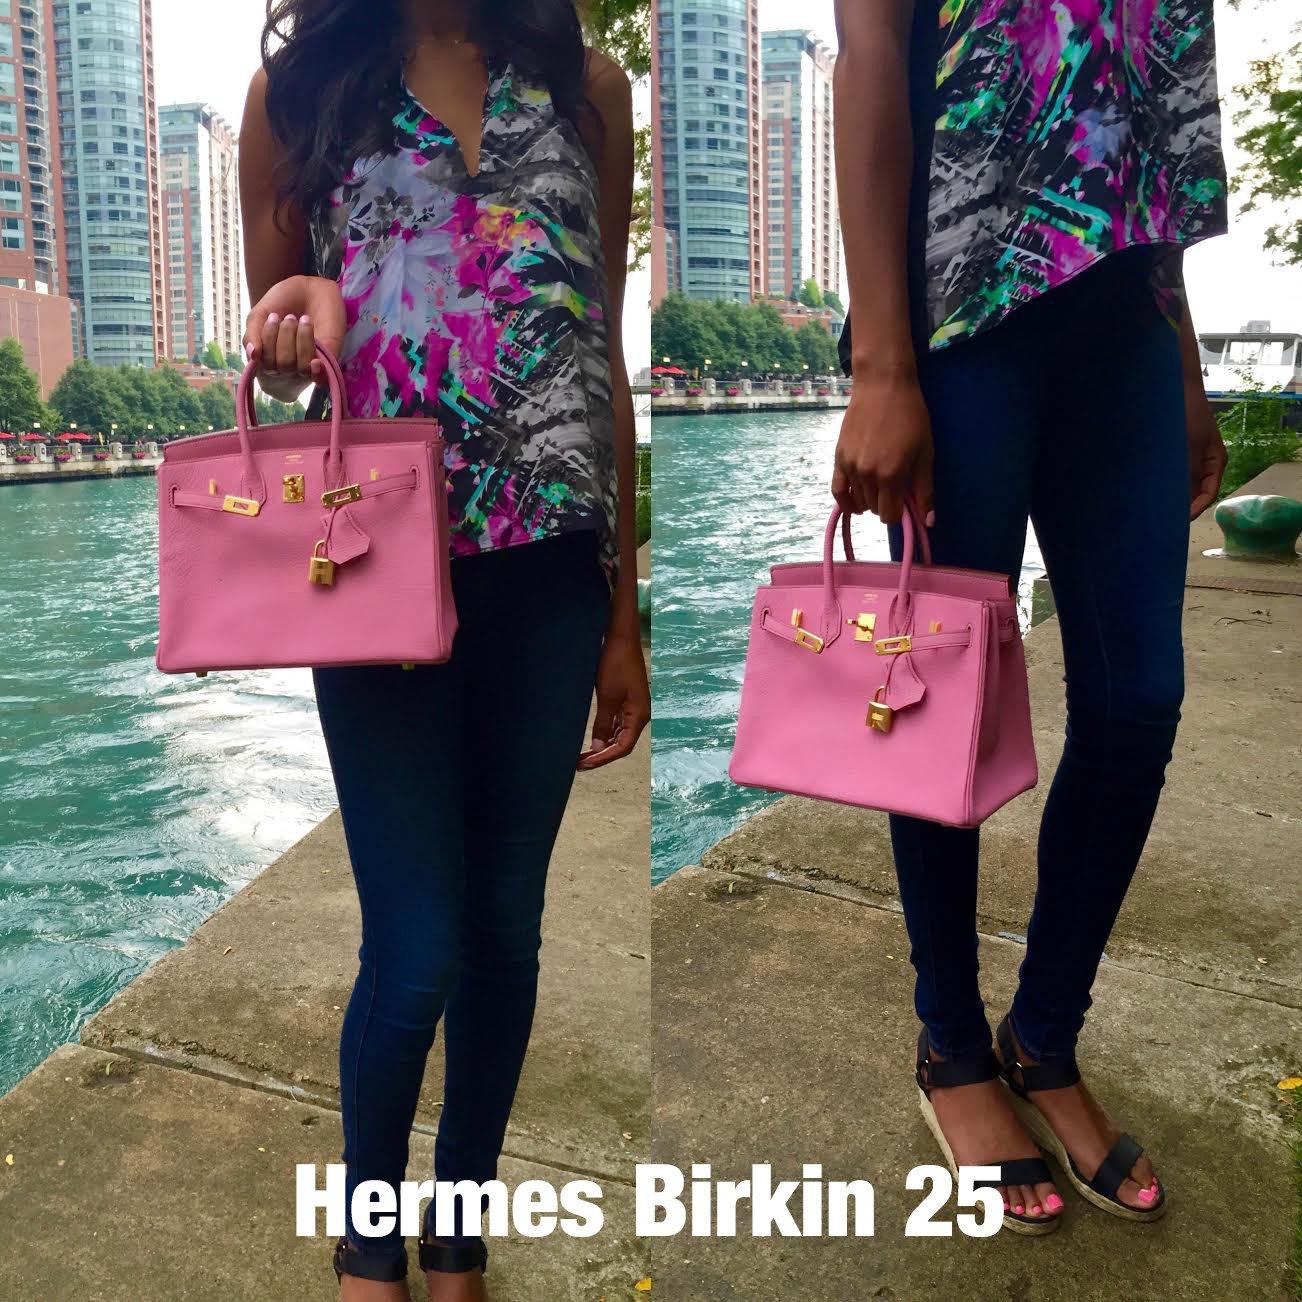 Hermes Birkin Pursebop - Best Purse Image Ccdbb.Org 6a646e588b77a